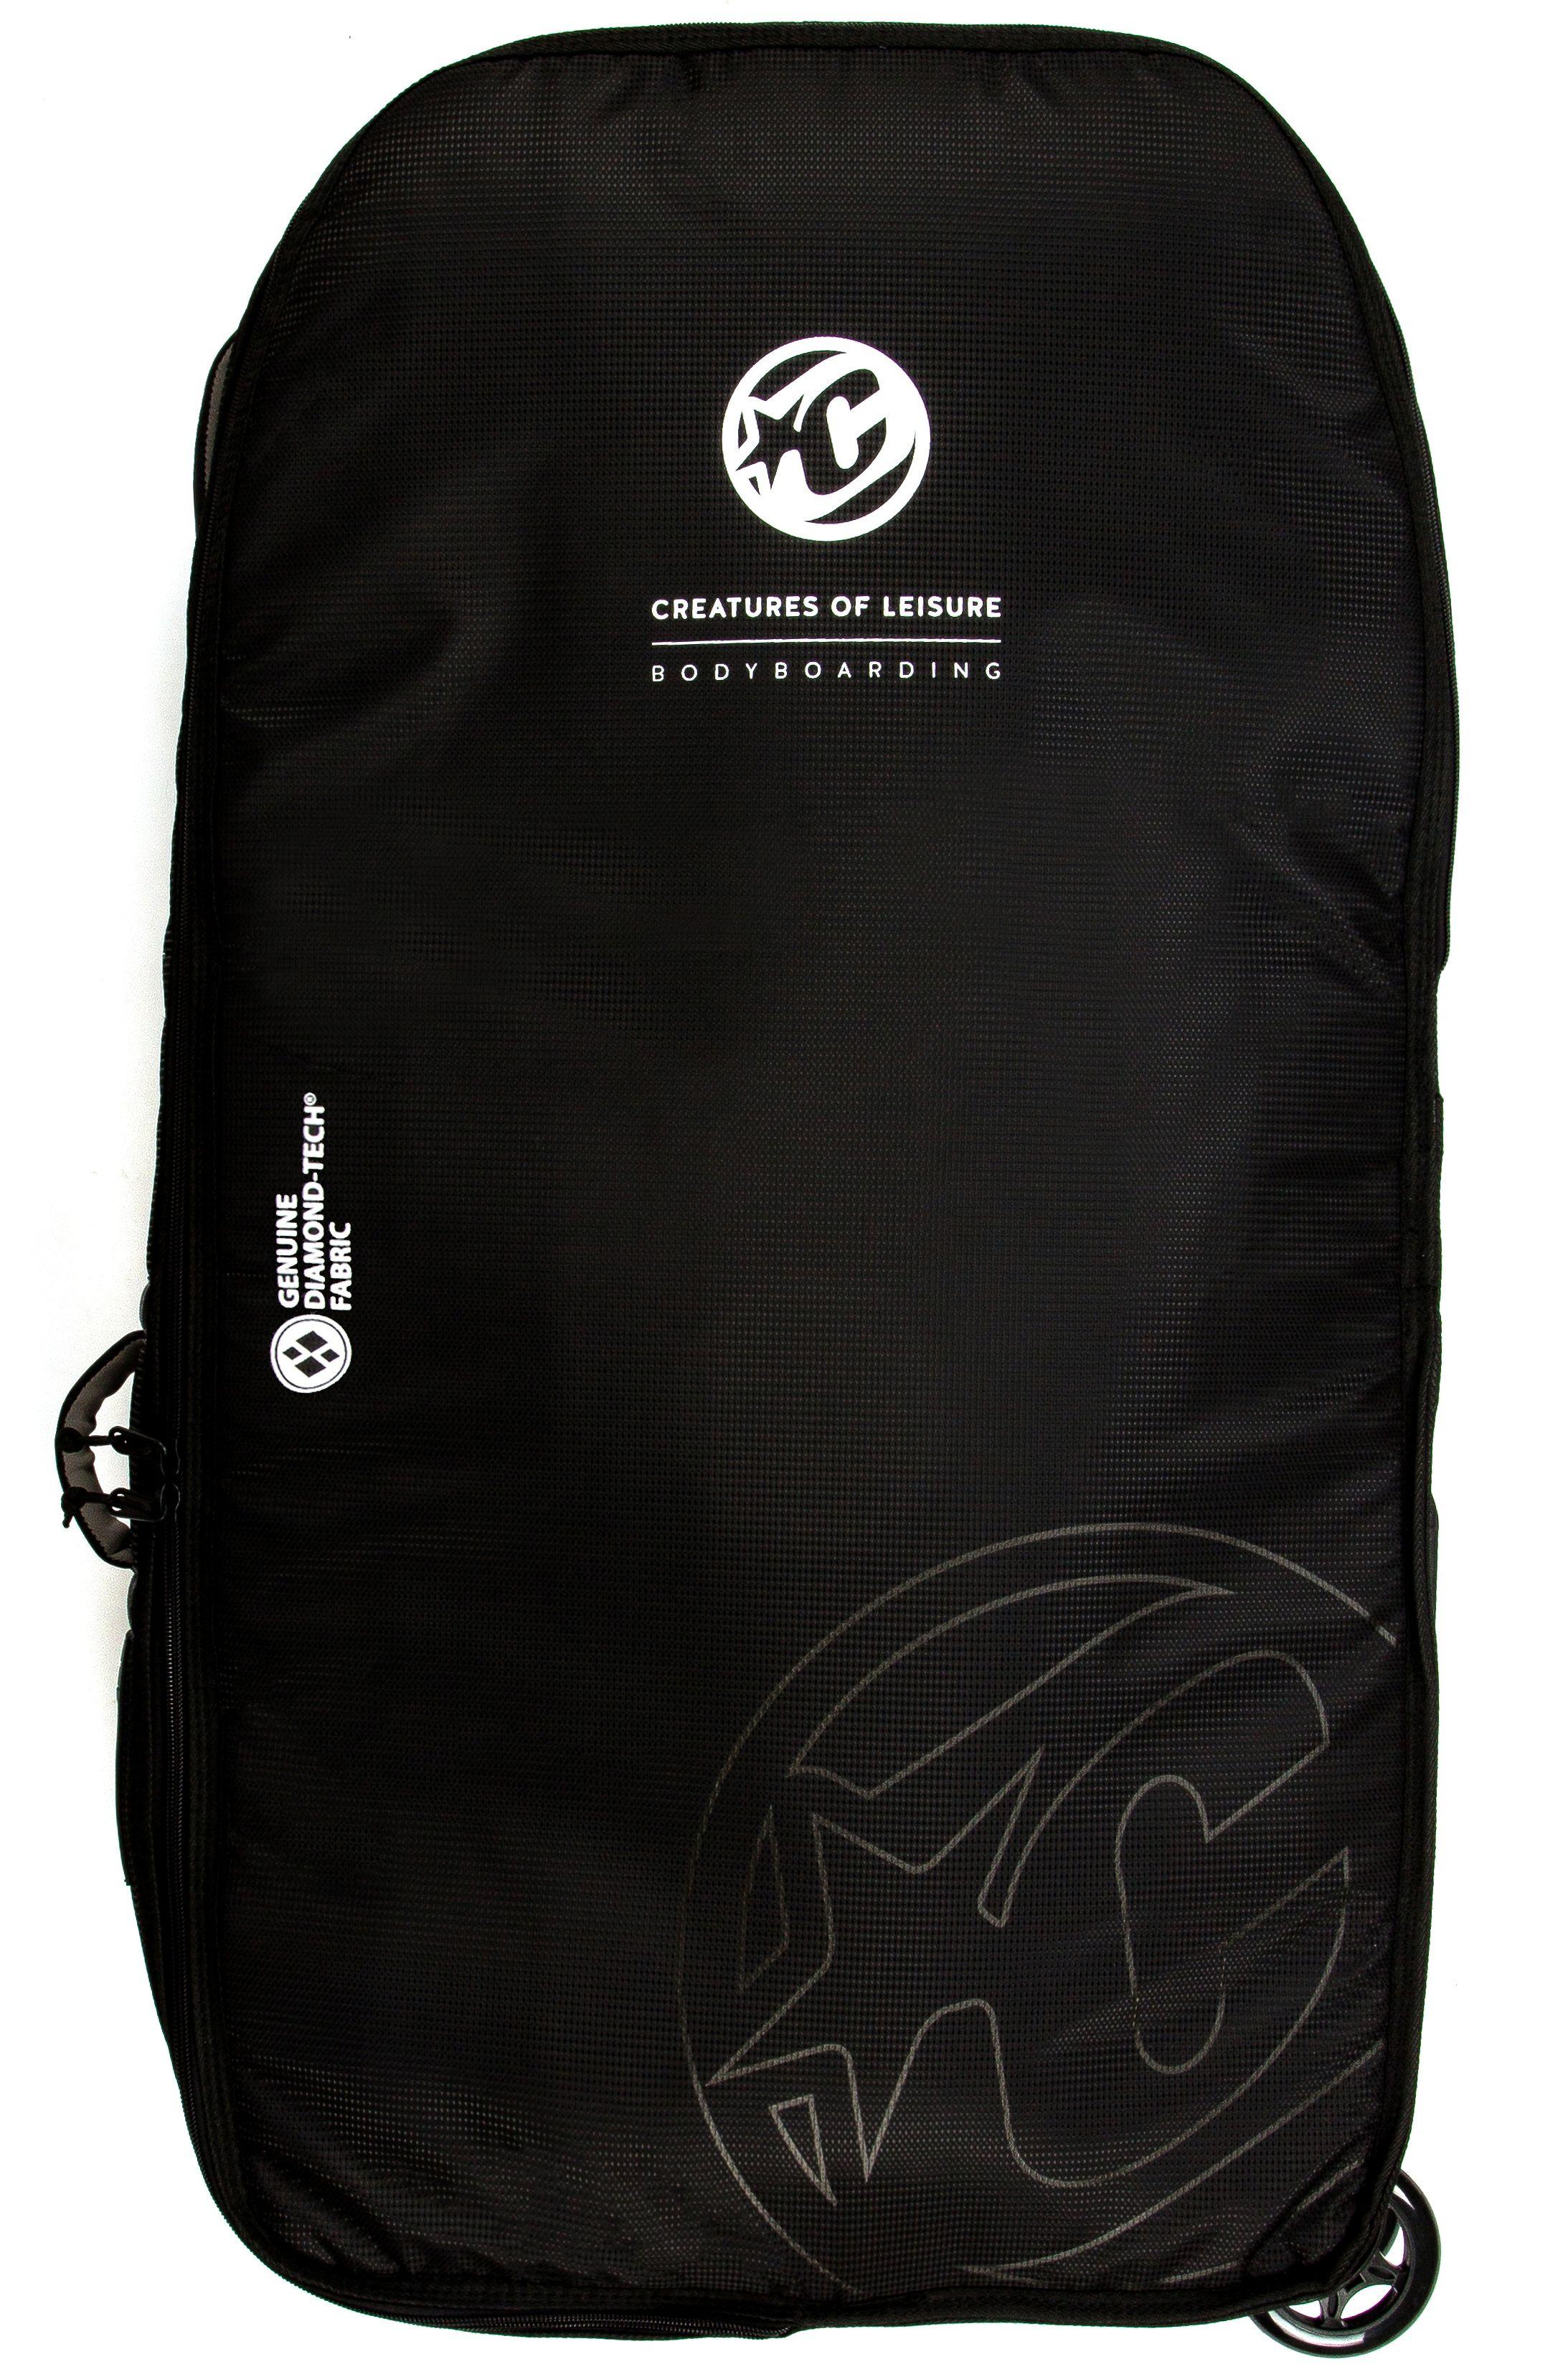 Creatures Boardbag BODYBOARD QUAD WHEELY 10mm Black Charcoal